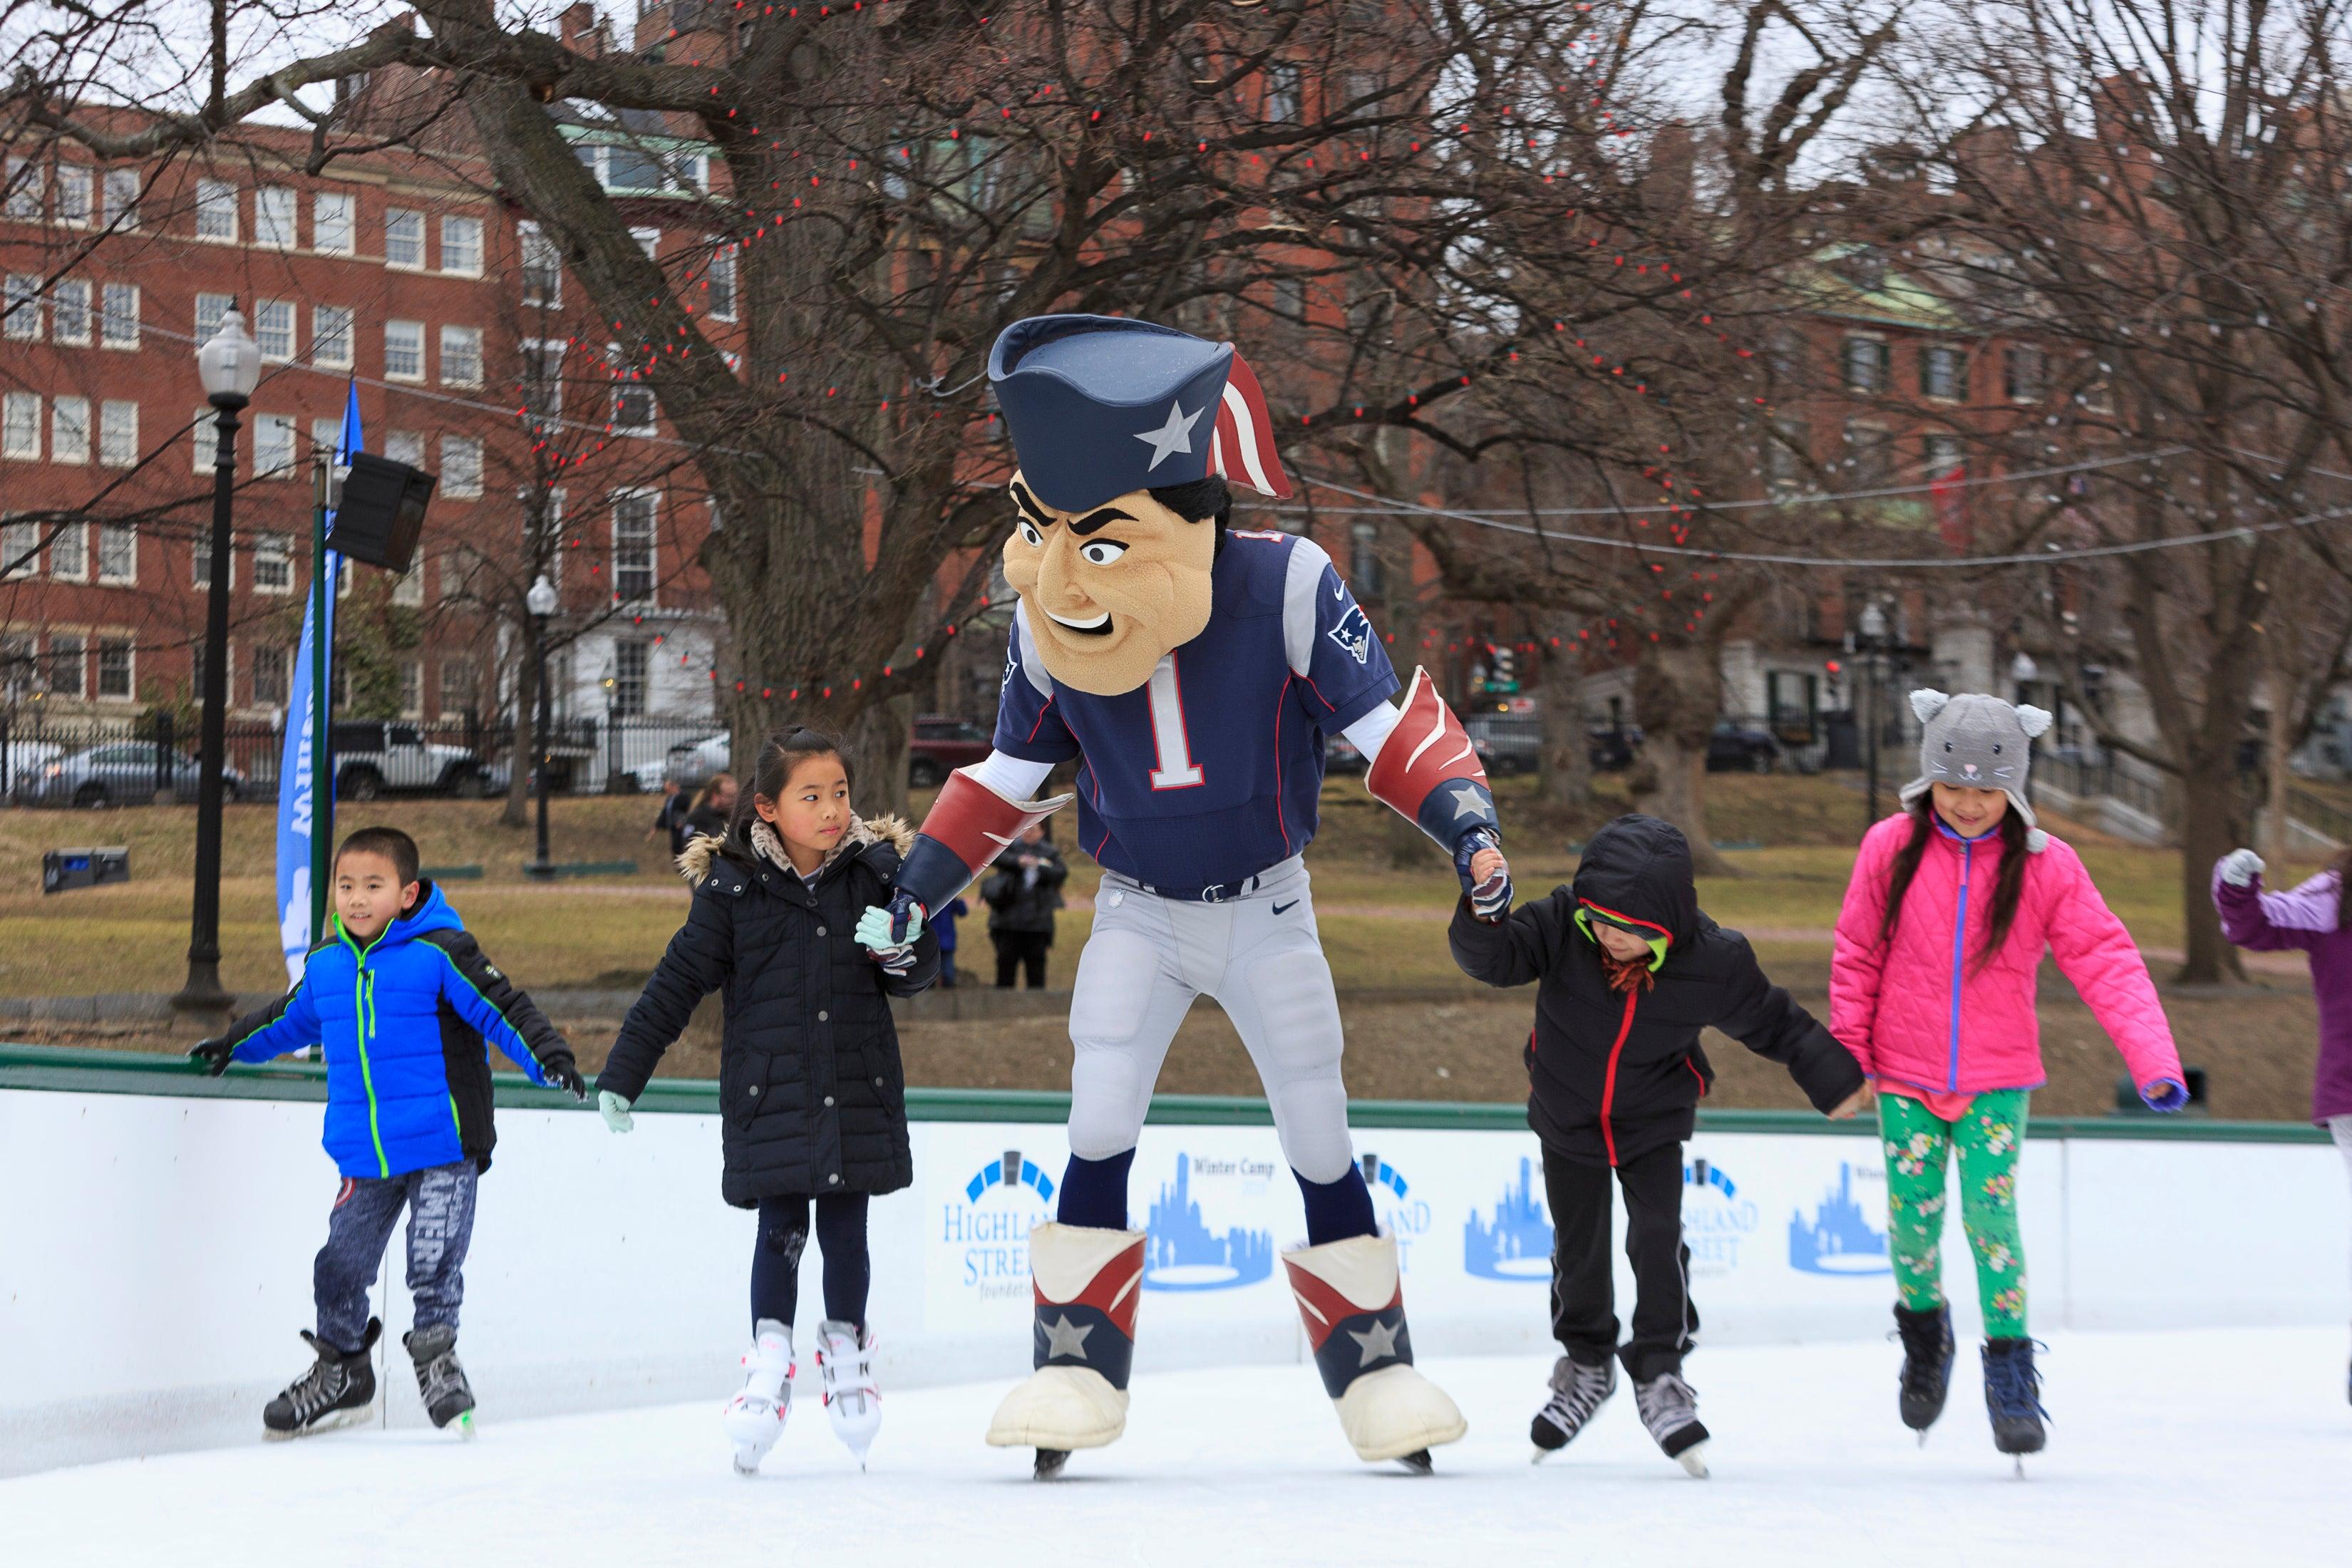 Children's Winter Festival on the Boston Common